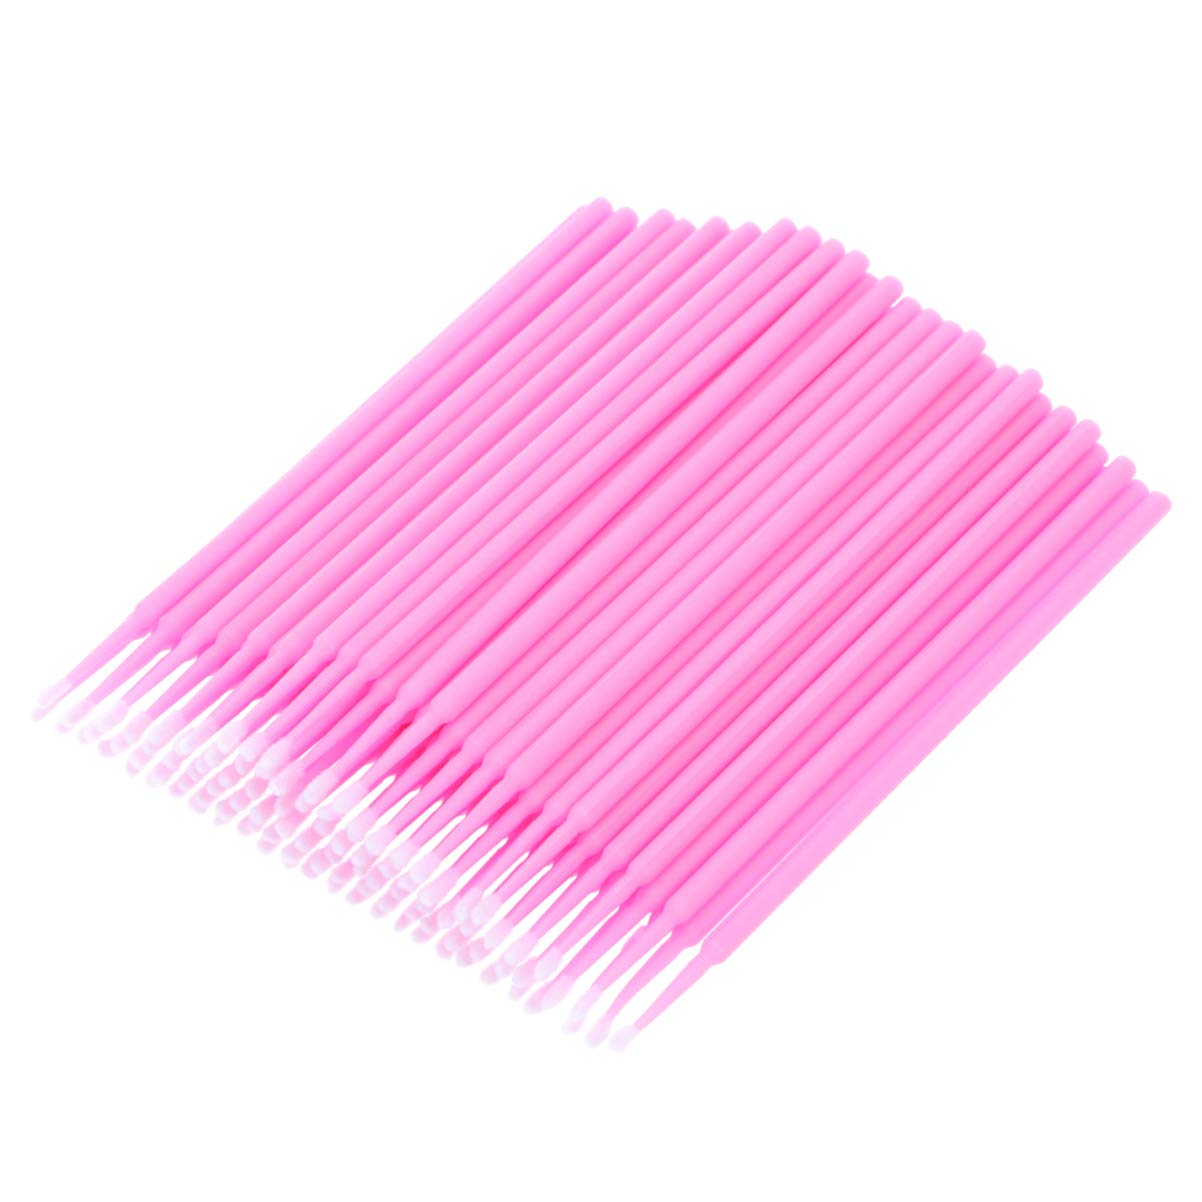 Artibetter Large special price !! New life 100pcs Disposable Micro Extension Mak Brushes Eyelash